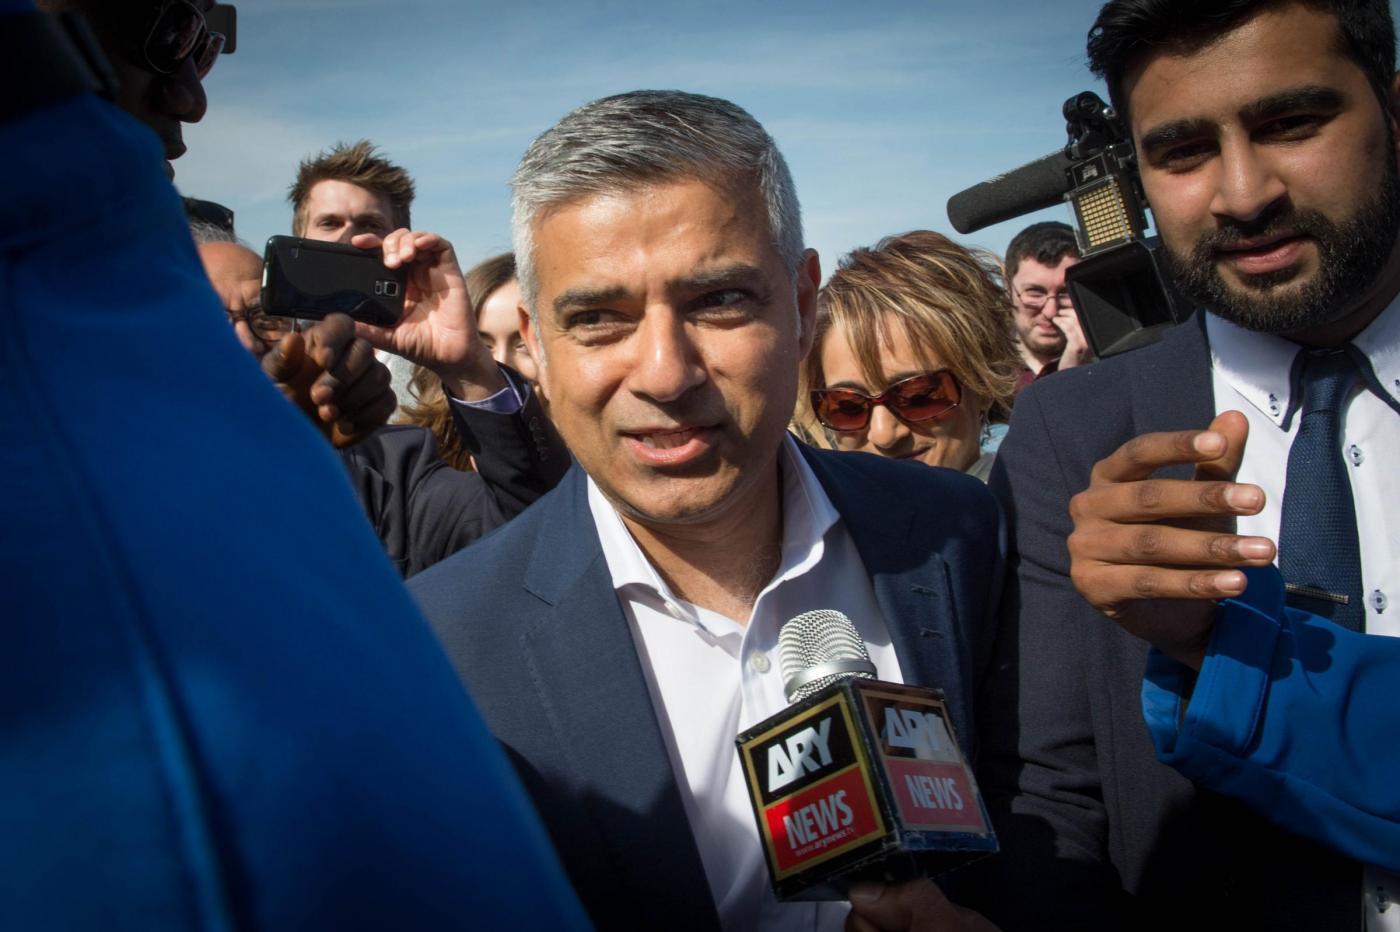 Londra, il nuovo sindaco è il musulmano laburista Sadiq Khan